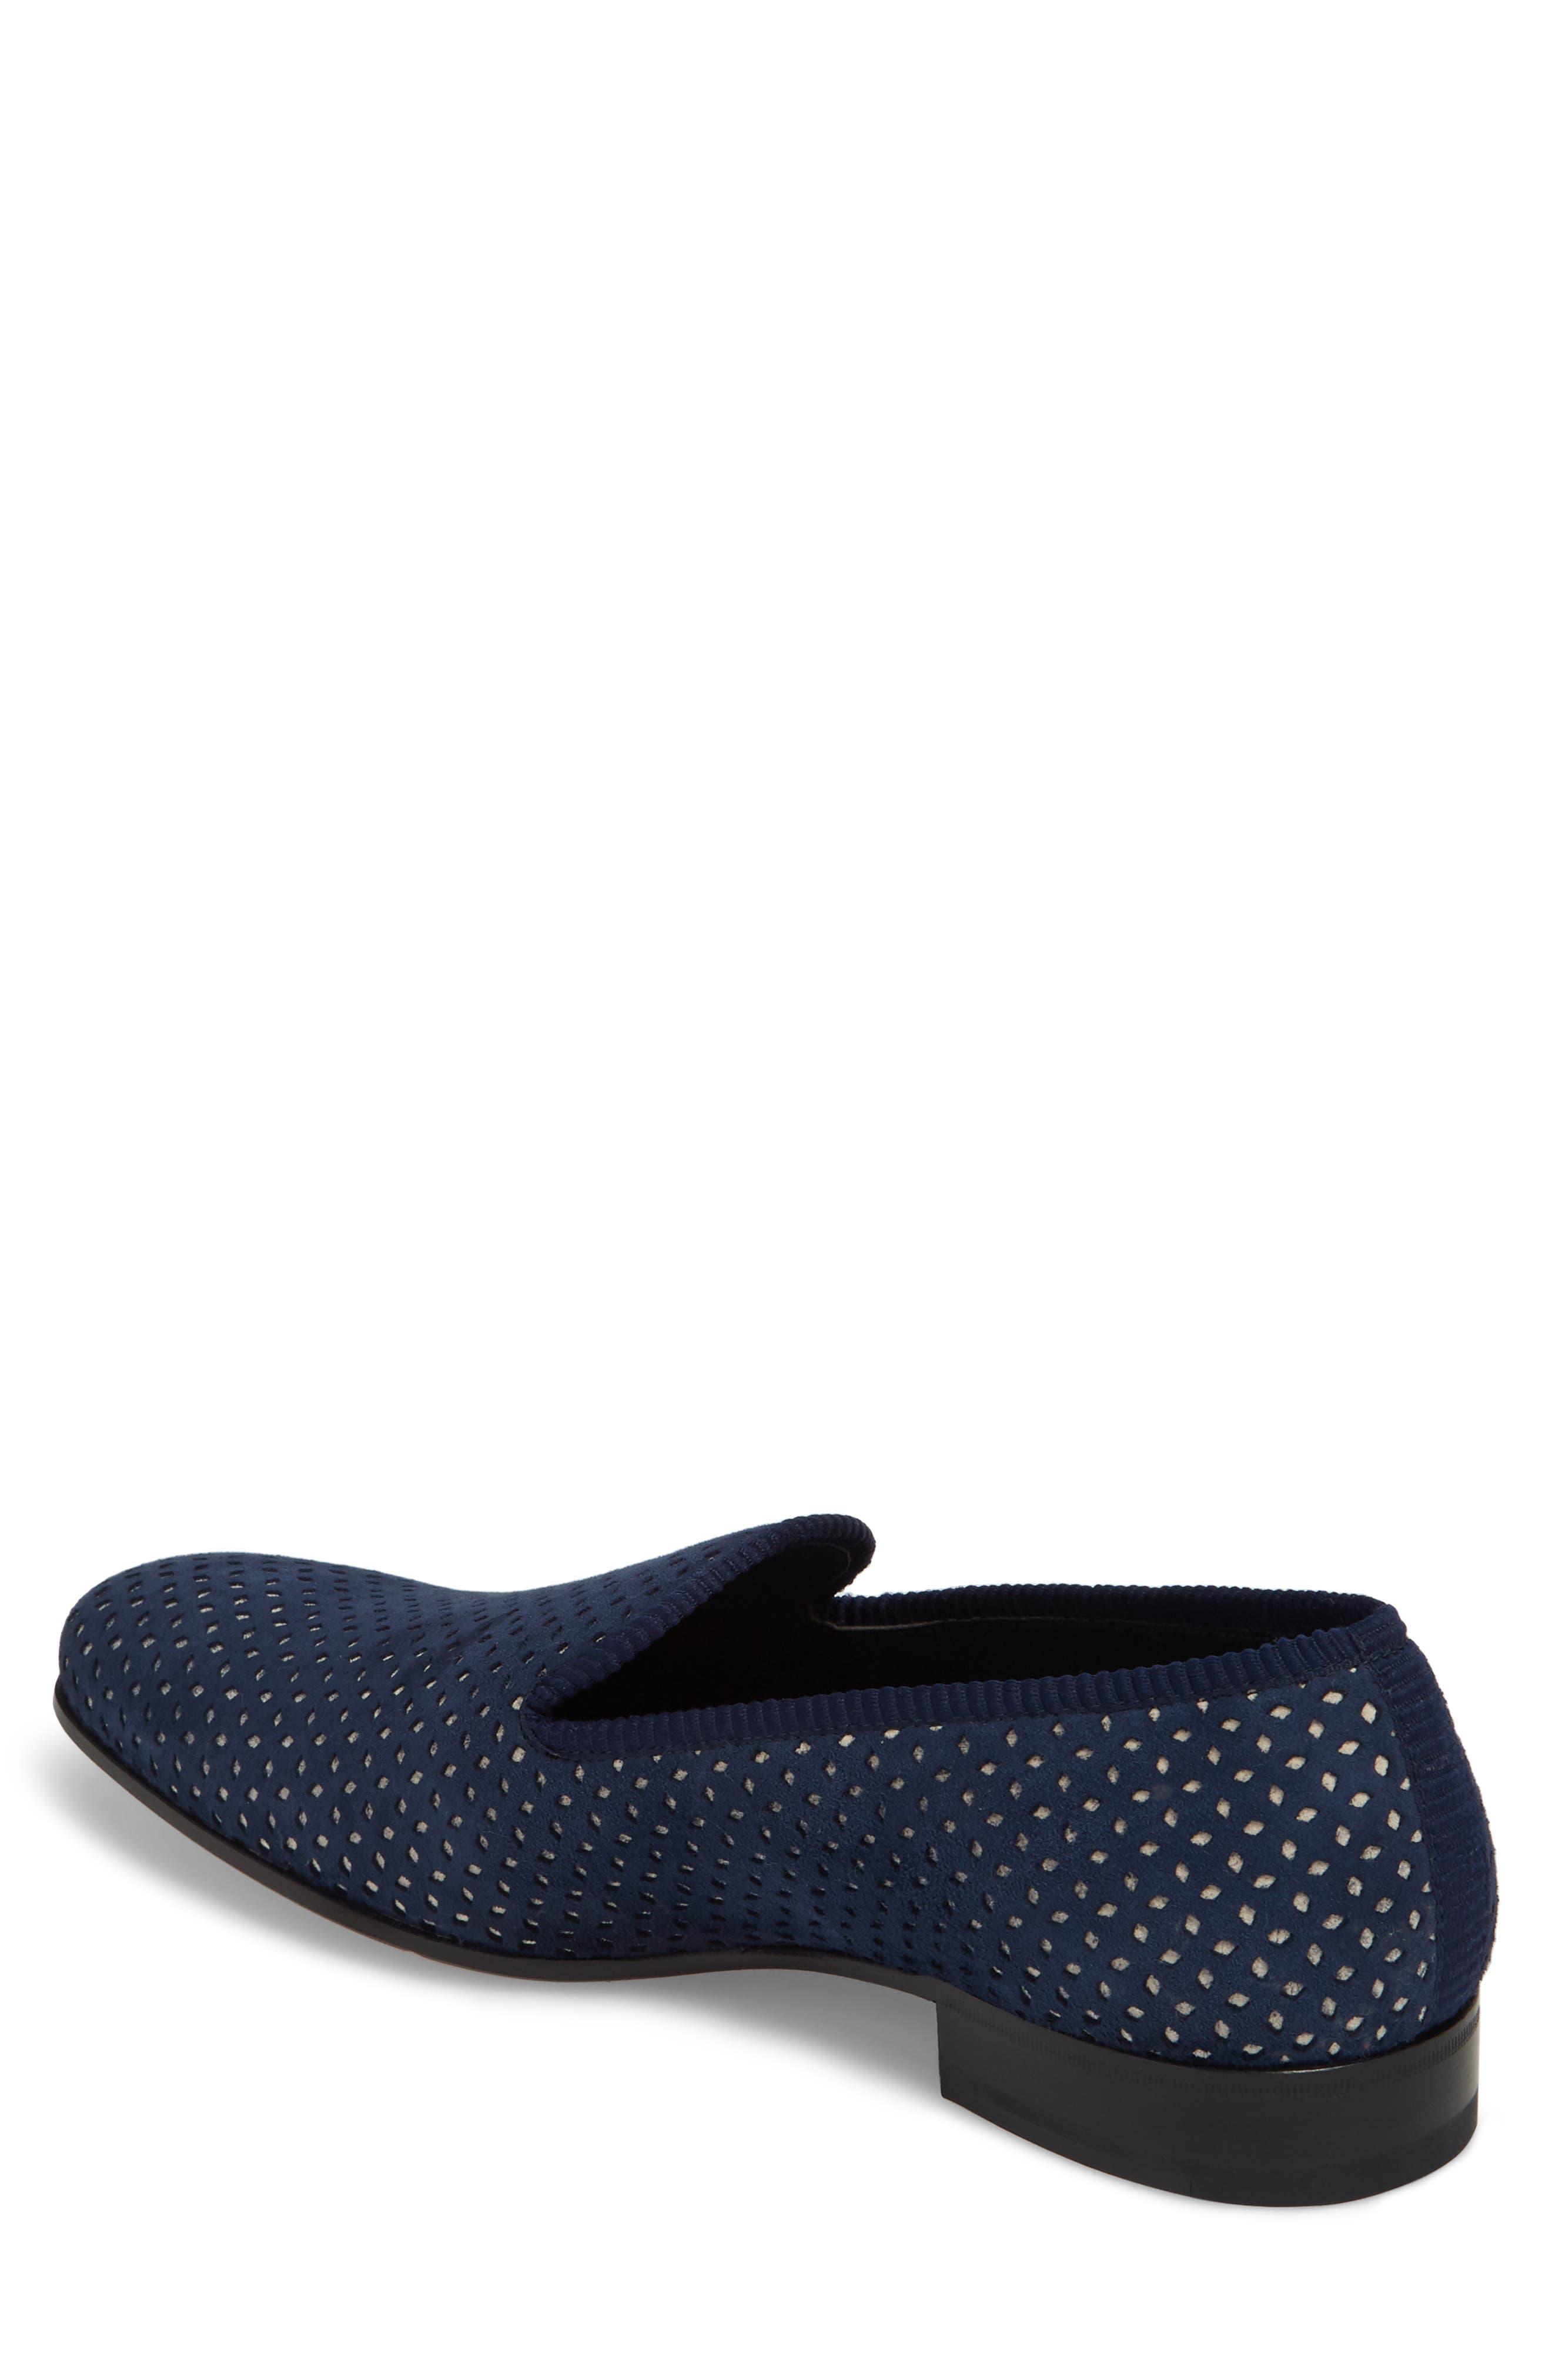 Cibeles Venetian Loafer,                             Alternate thumbnail 2, color,                             Blue/ Bone Suede